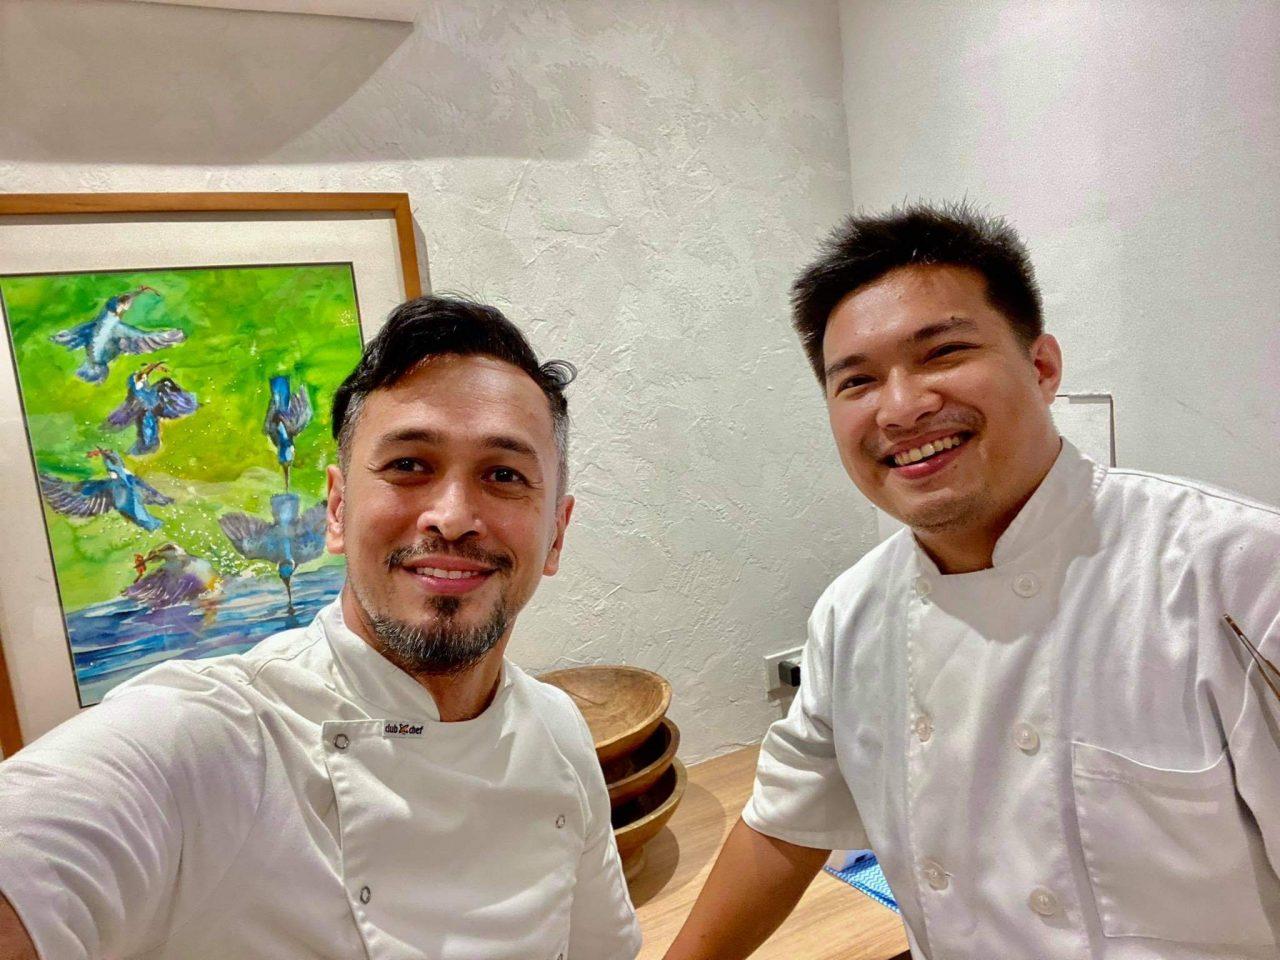 sau-del-rosario-and-resident-chef-oye-panganiban-1280x960.jpg